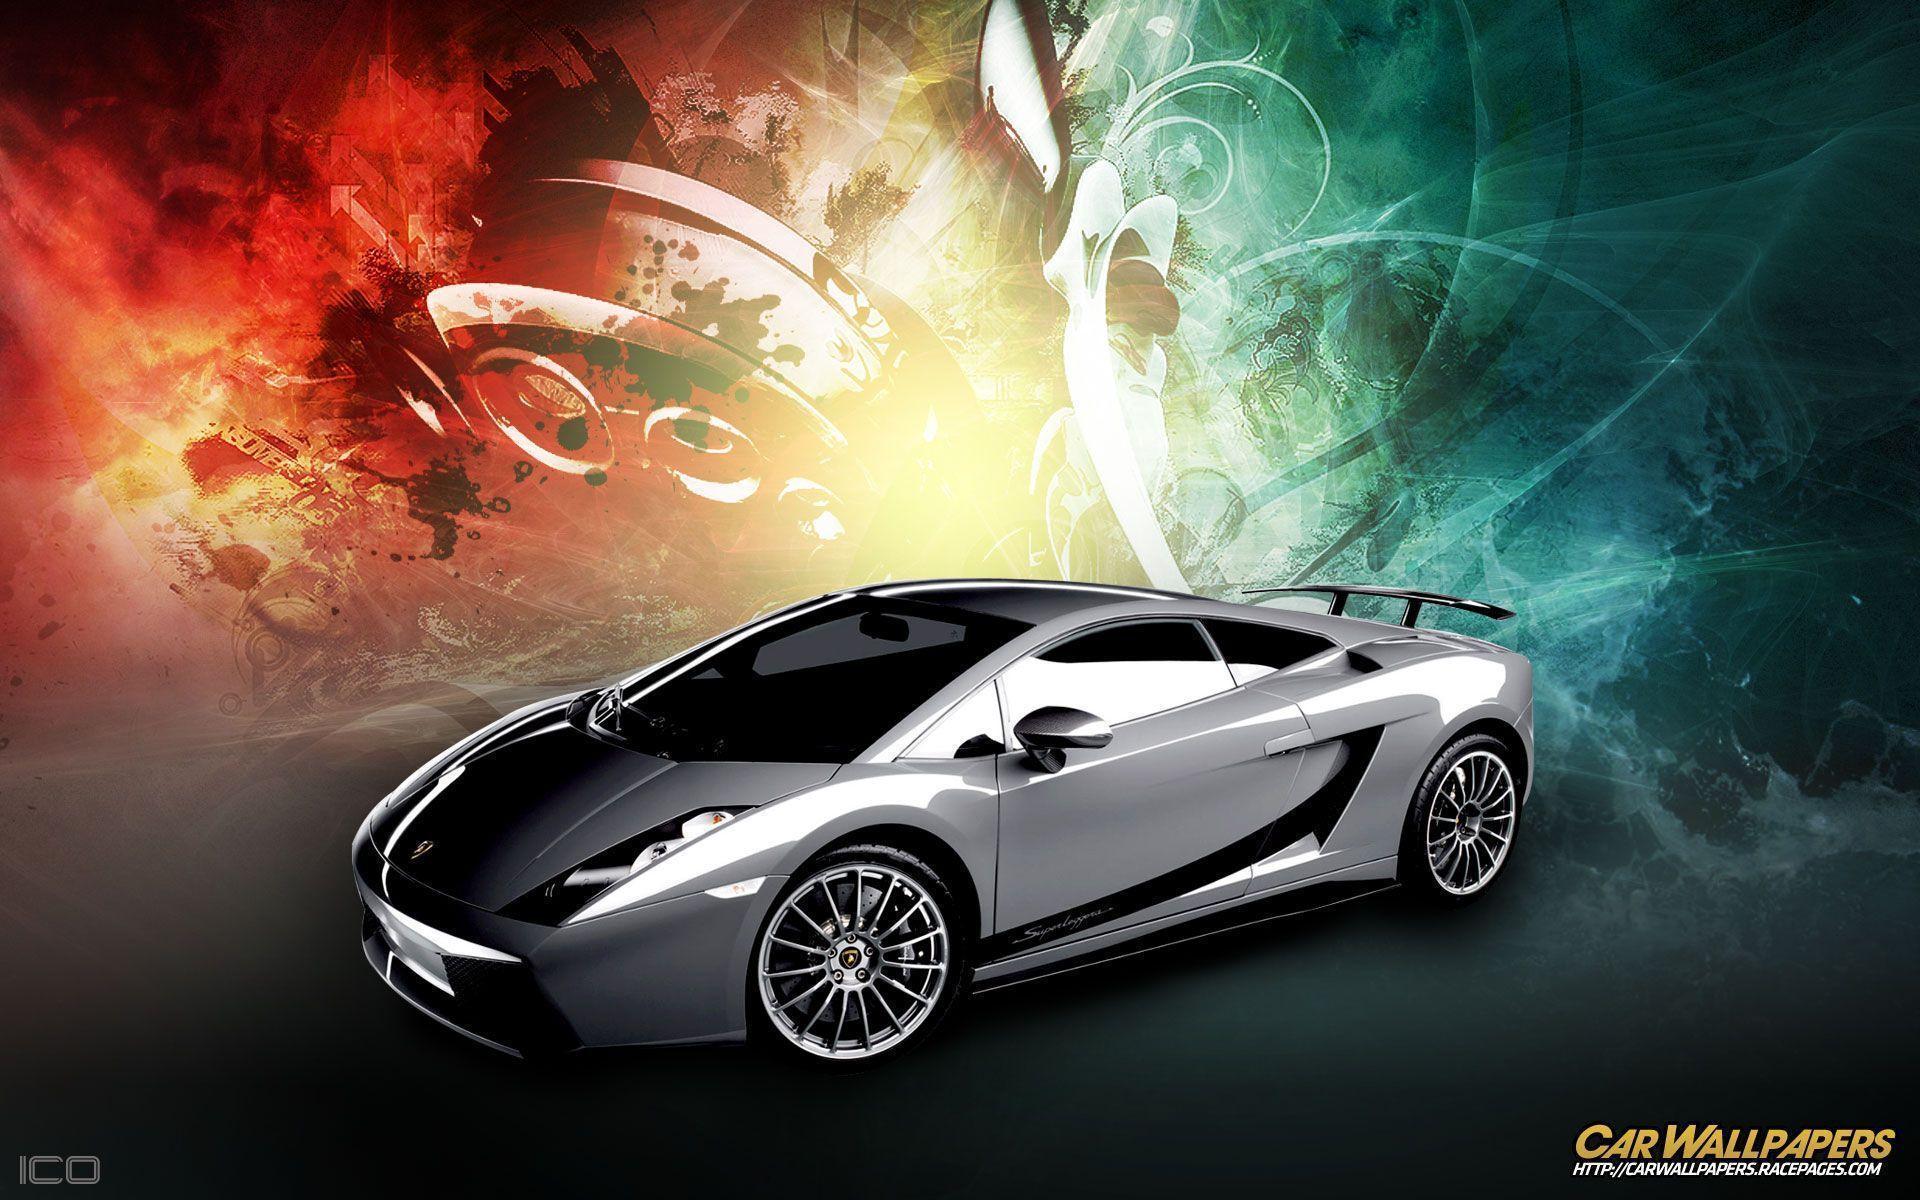 Lamborghini Wallpapers For Windows 8 · Lamborghini Wallpapers ...